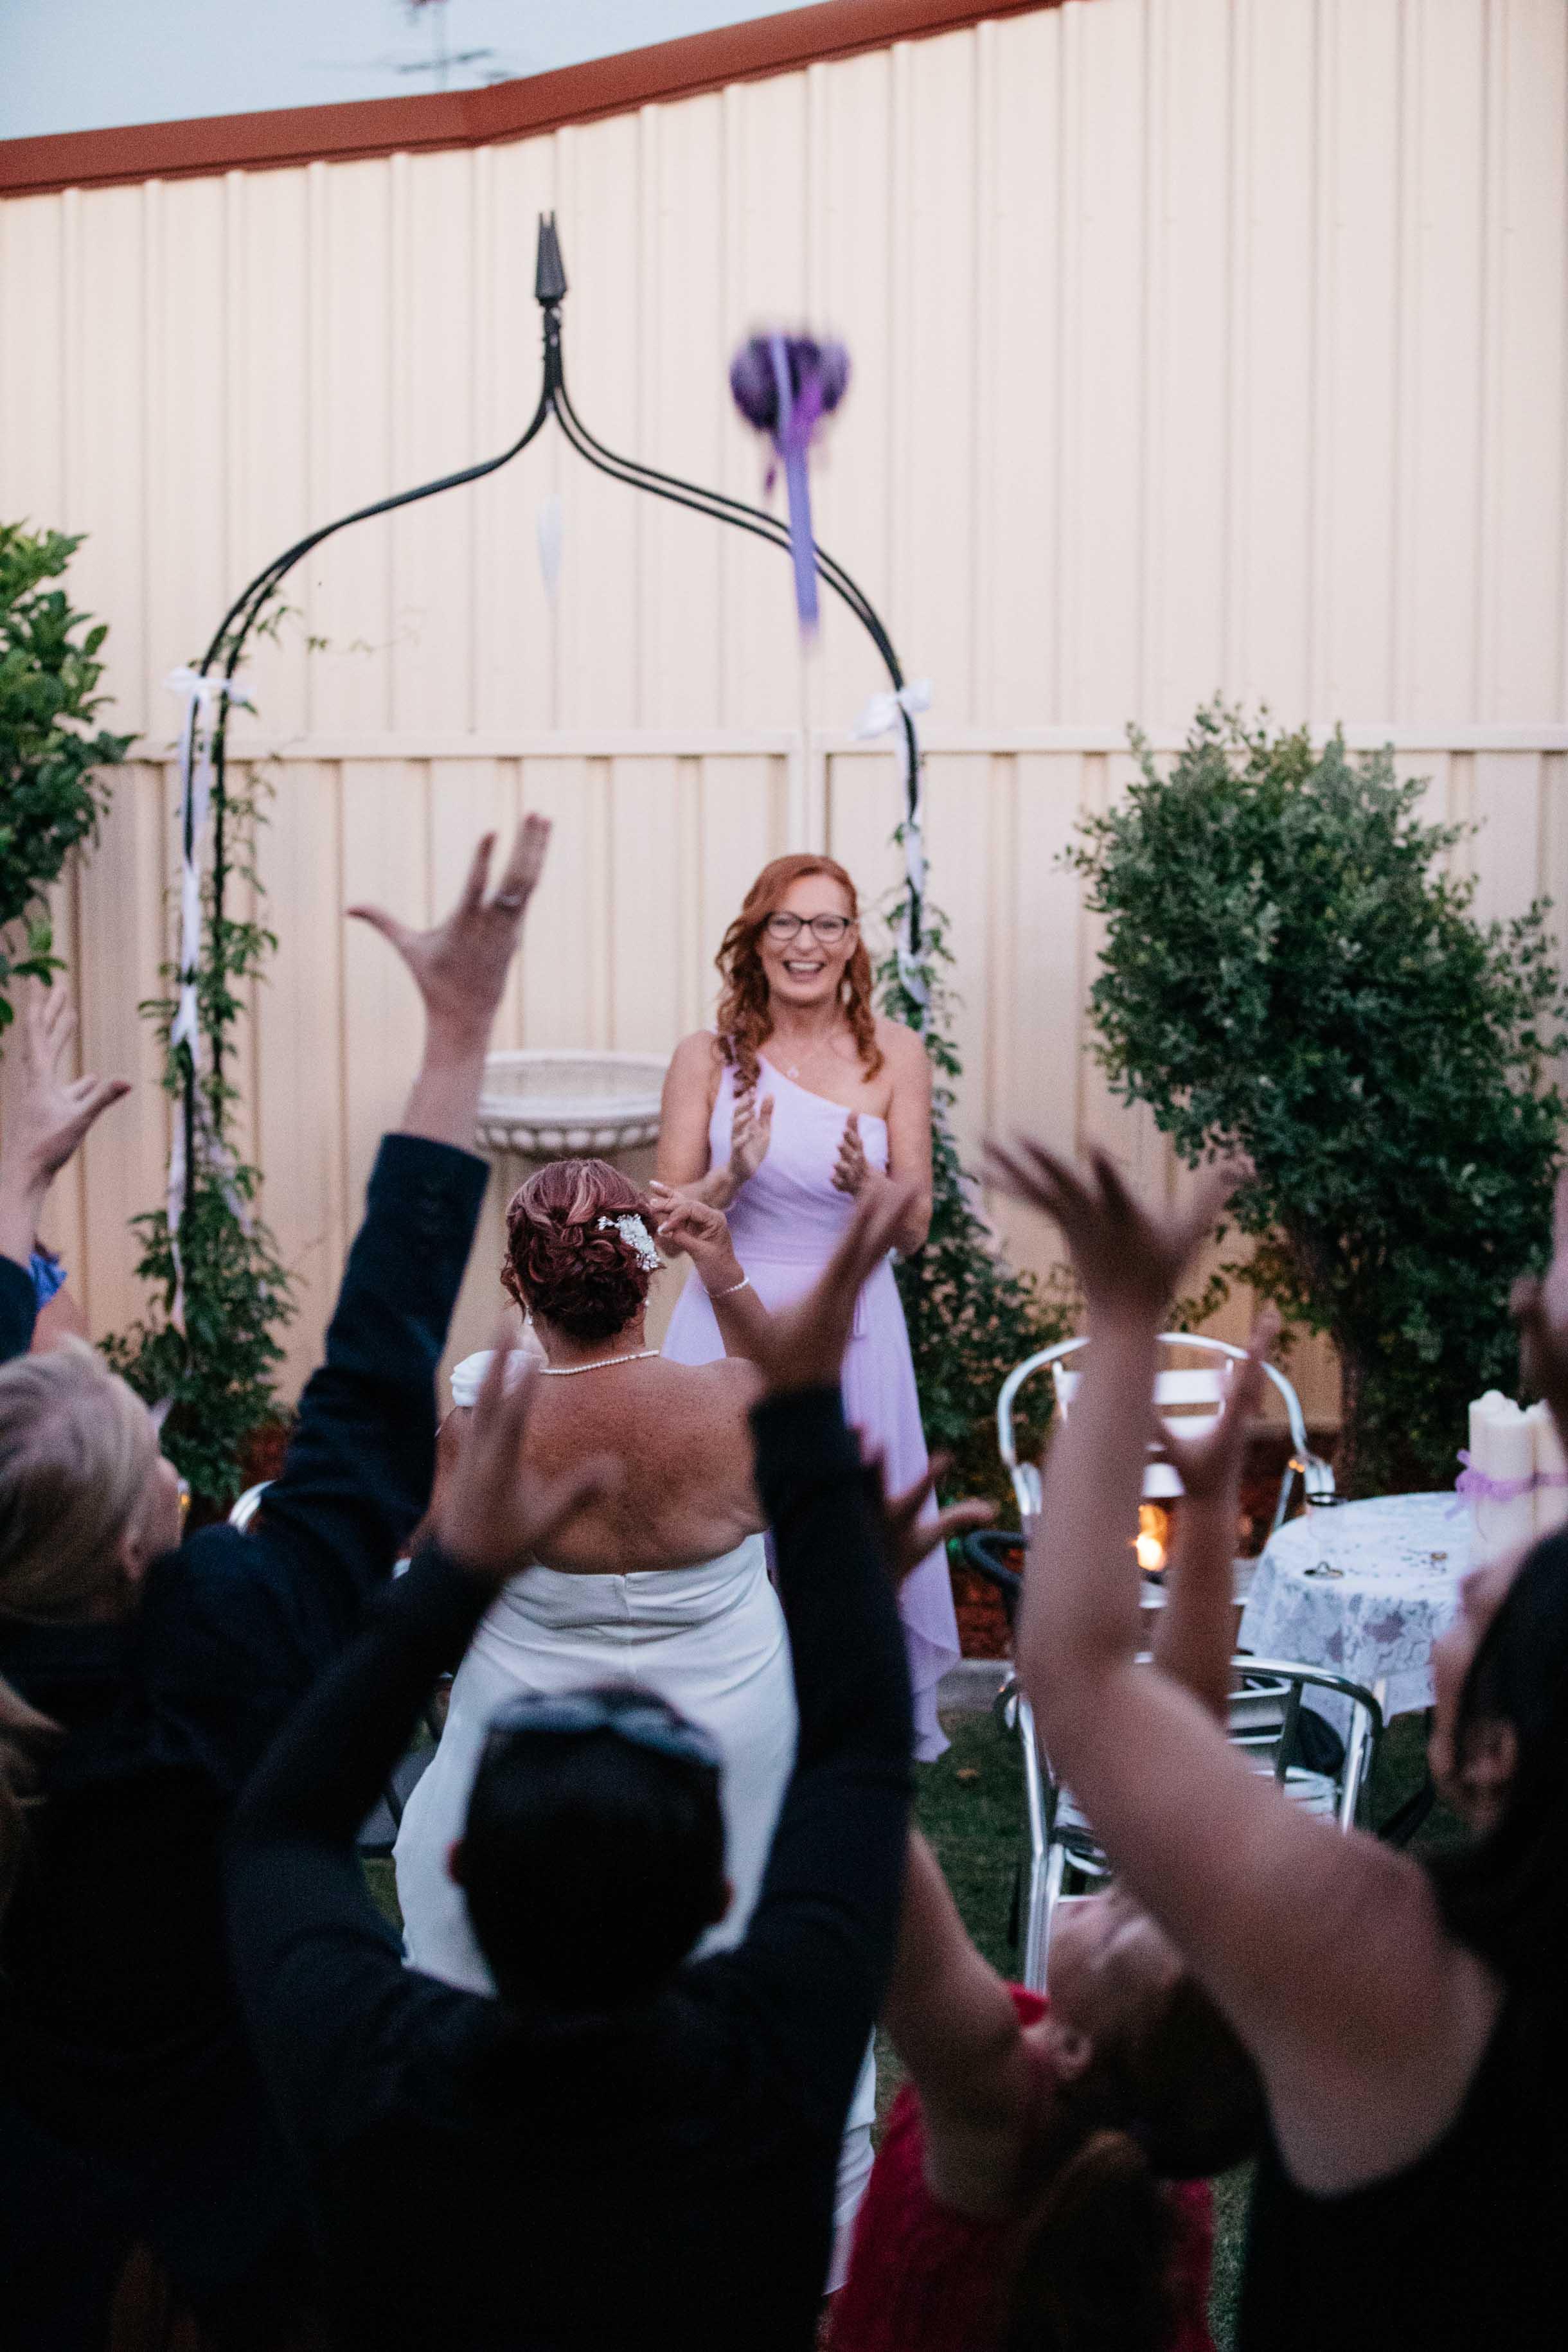 ELPIX_Events_Wedding_Cheryl&Michael-18.jpg